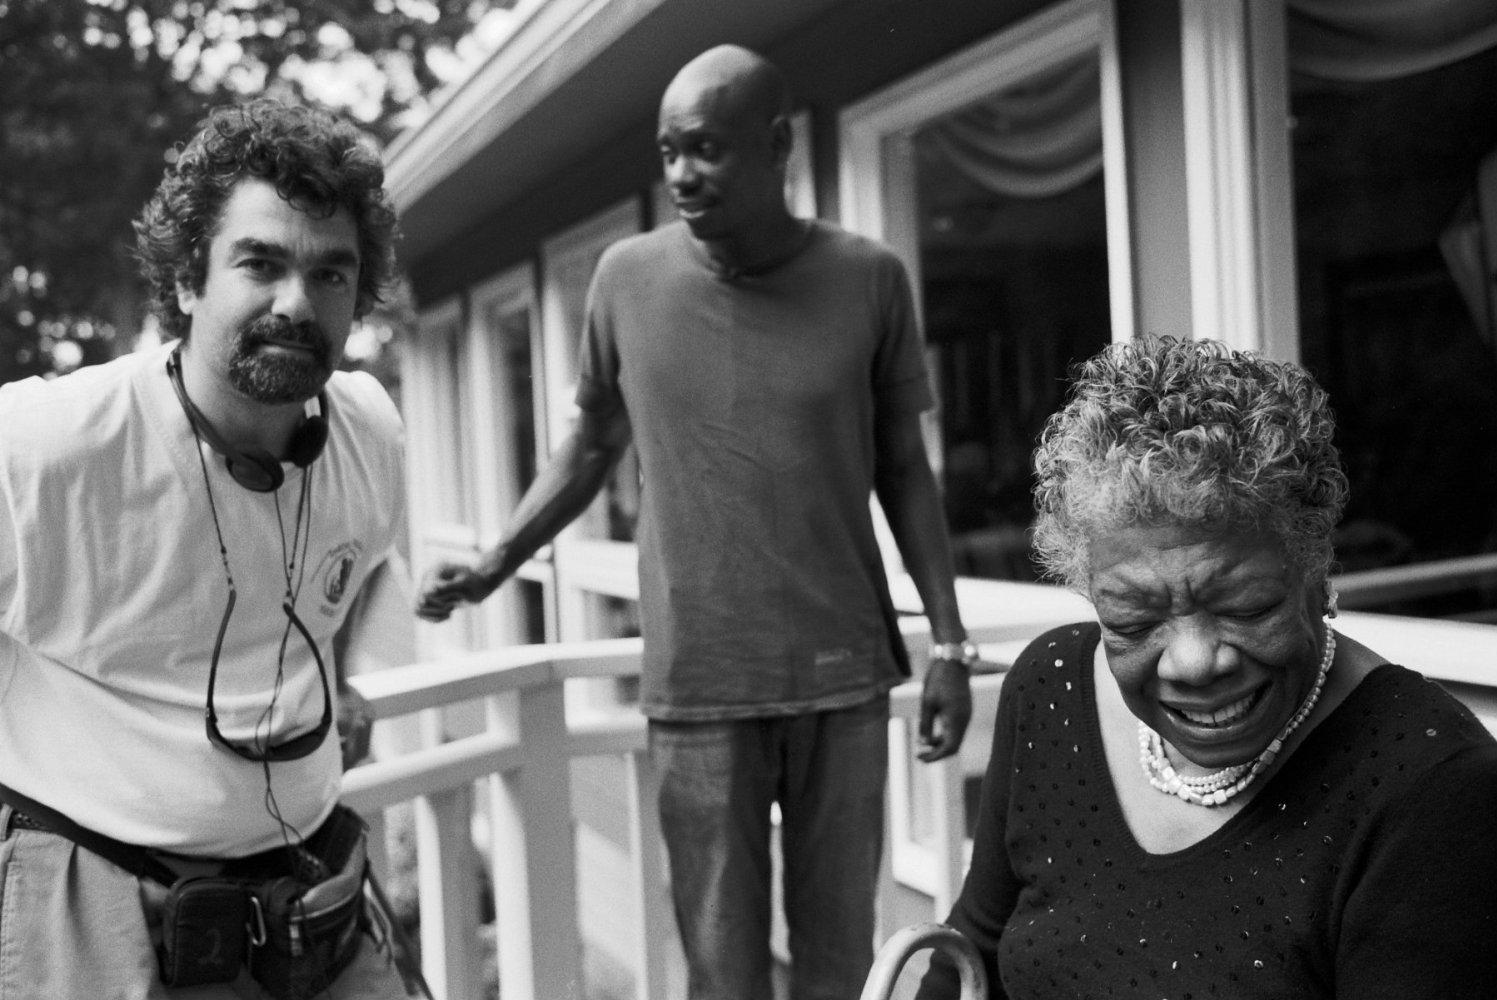 Celebrities Maya Angelou, Birthday: 4 April 1928, St